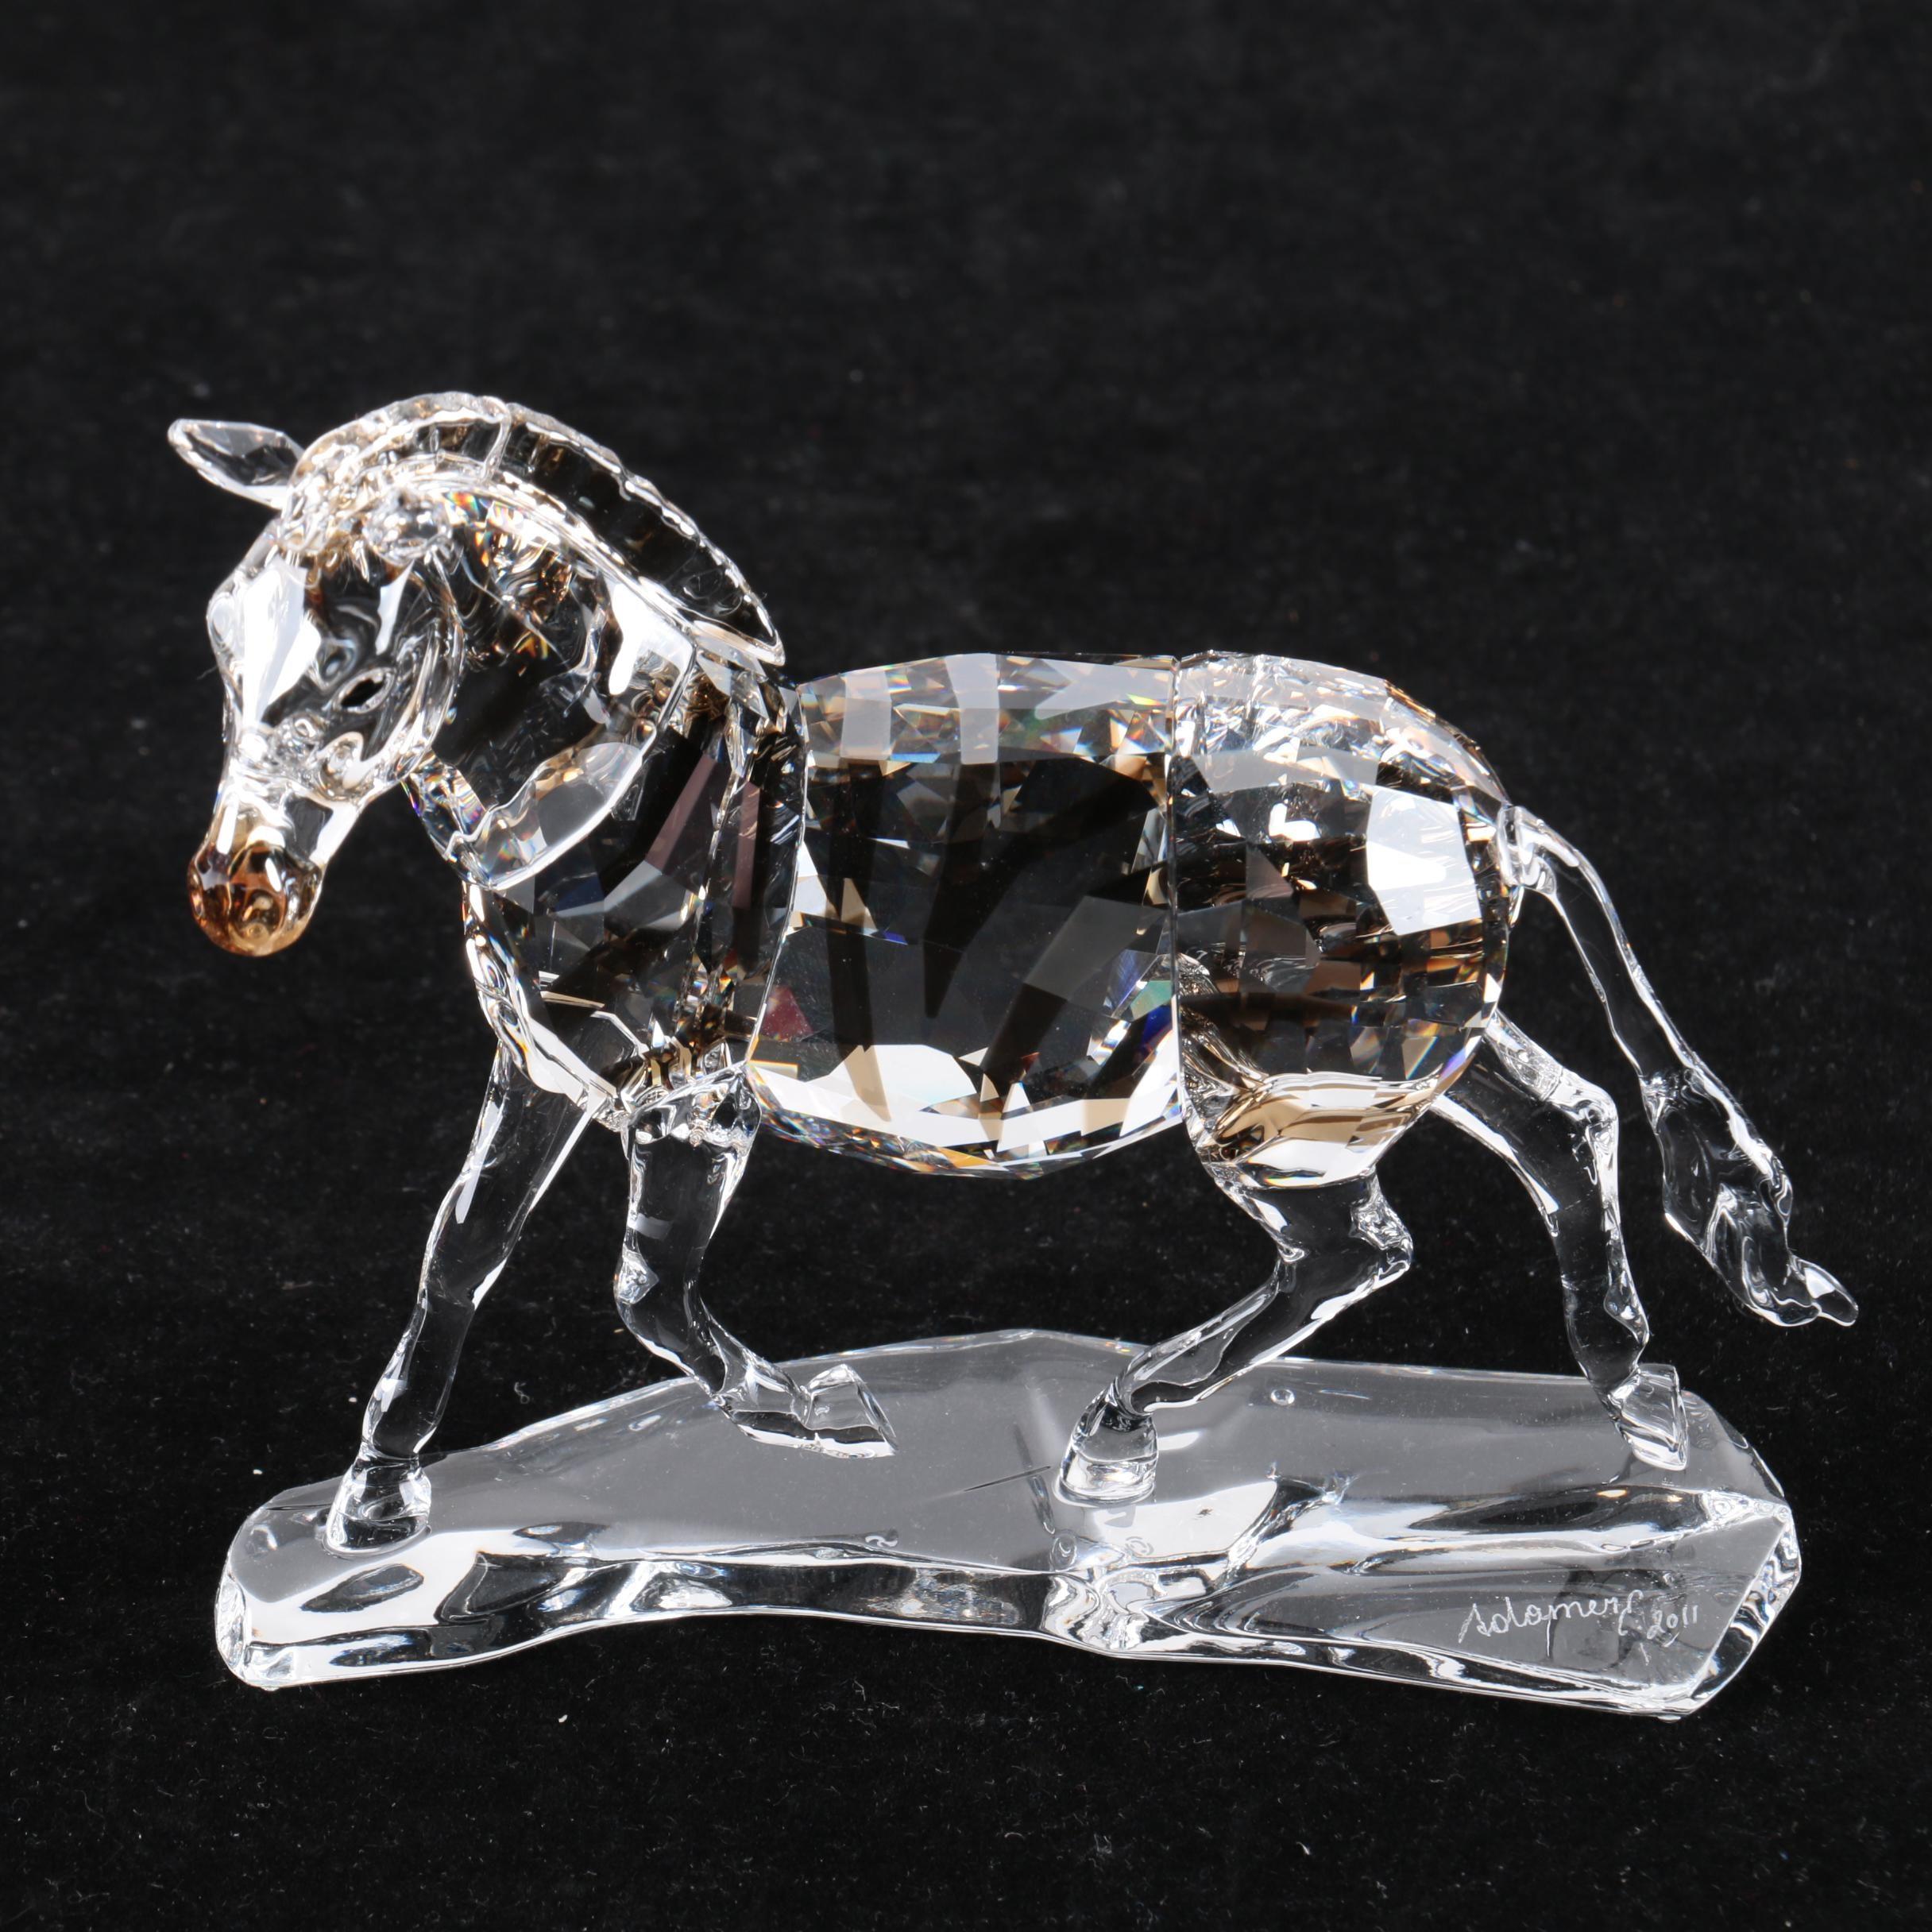 Swarovski Crystal Zebra Figurine by Elisabeth Adamer